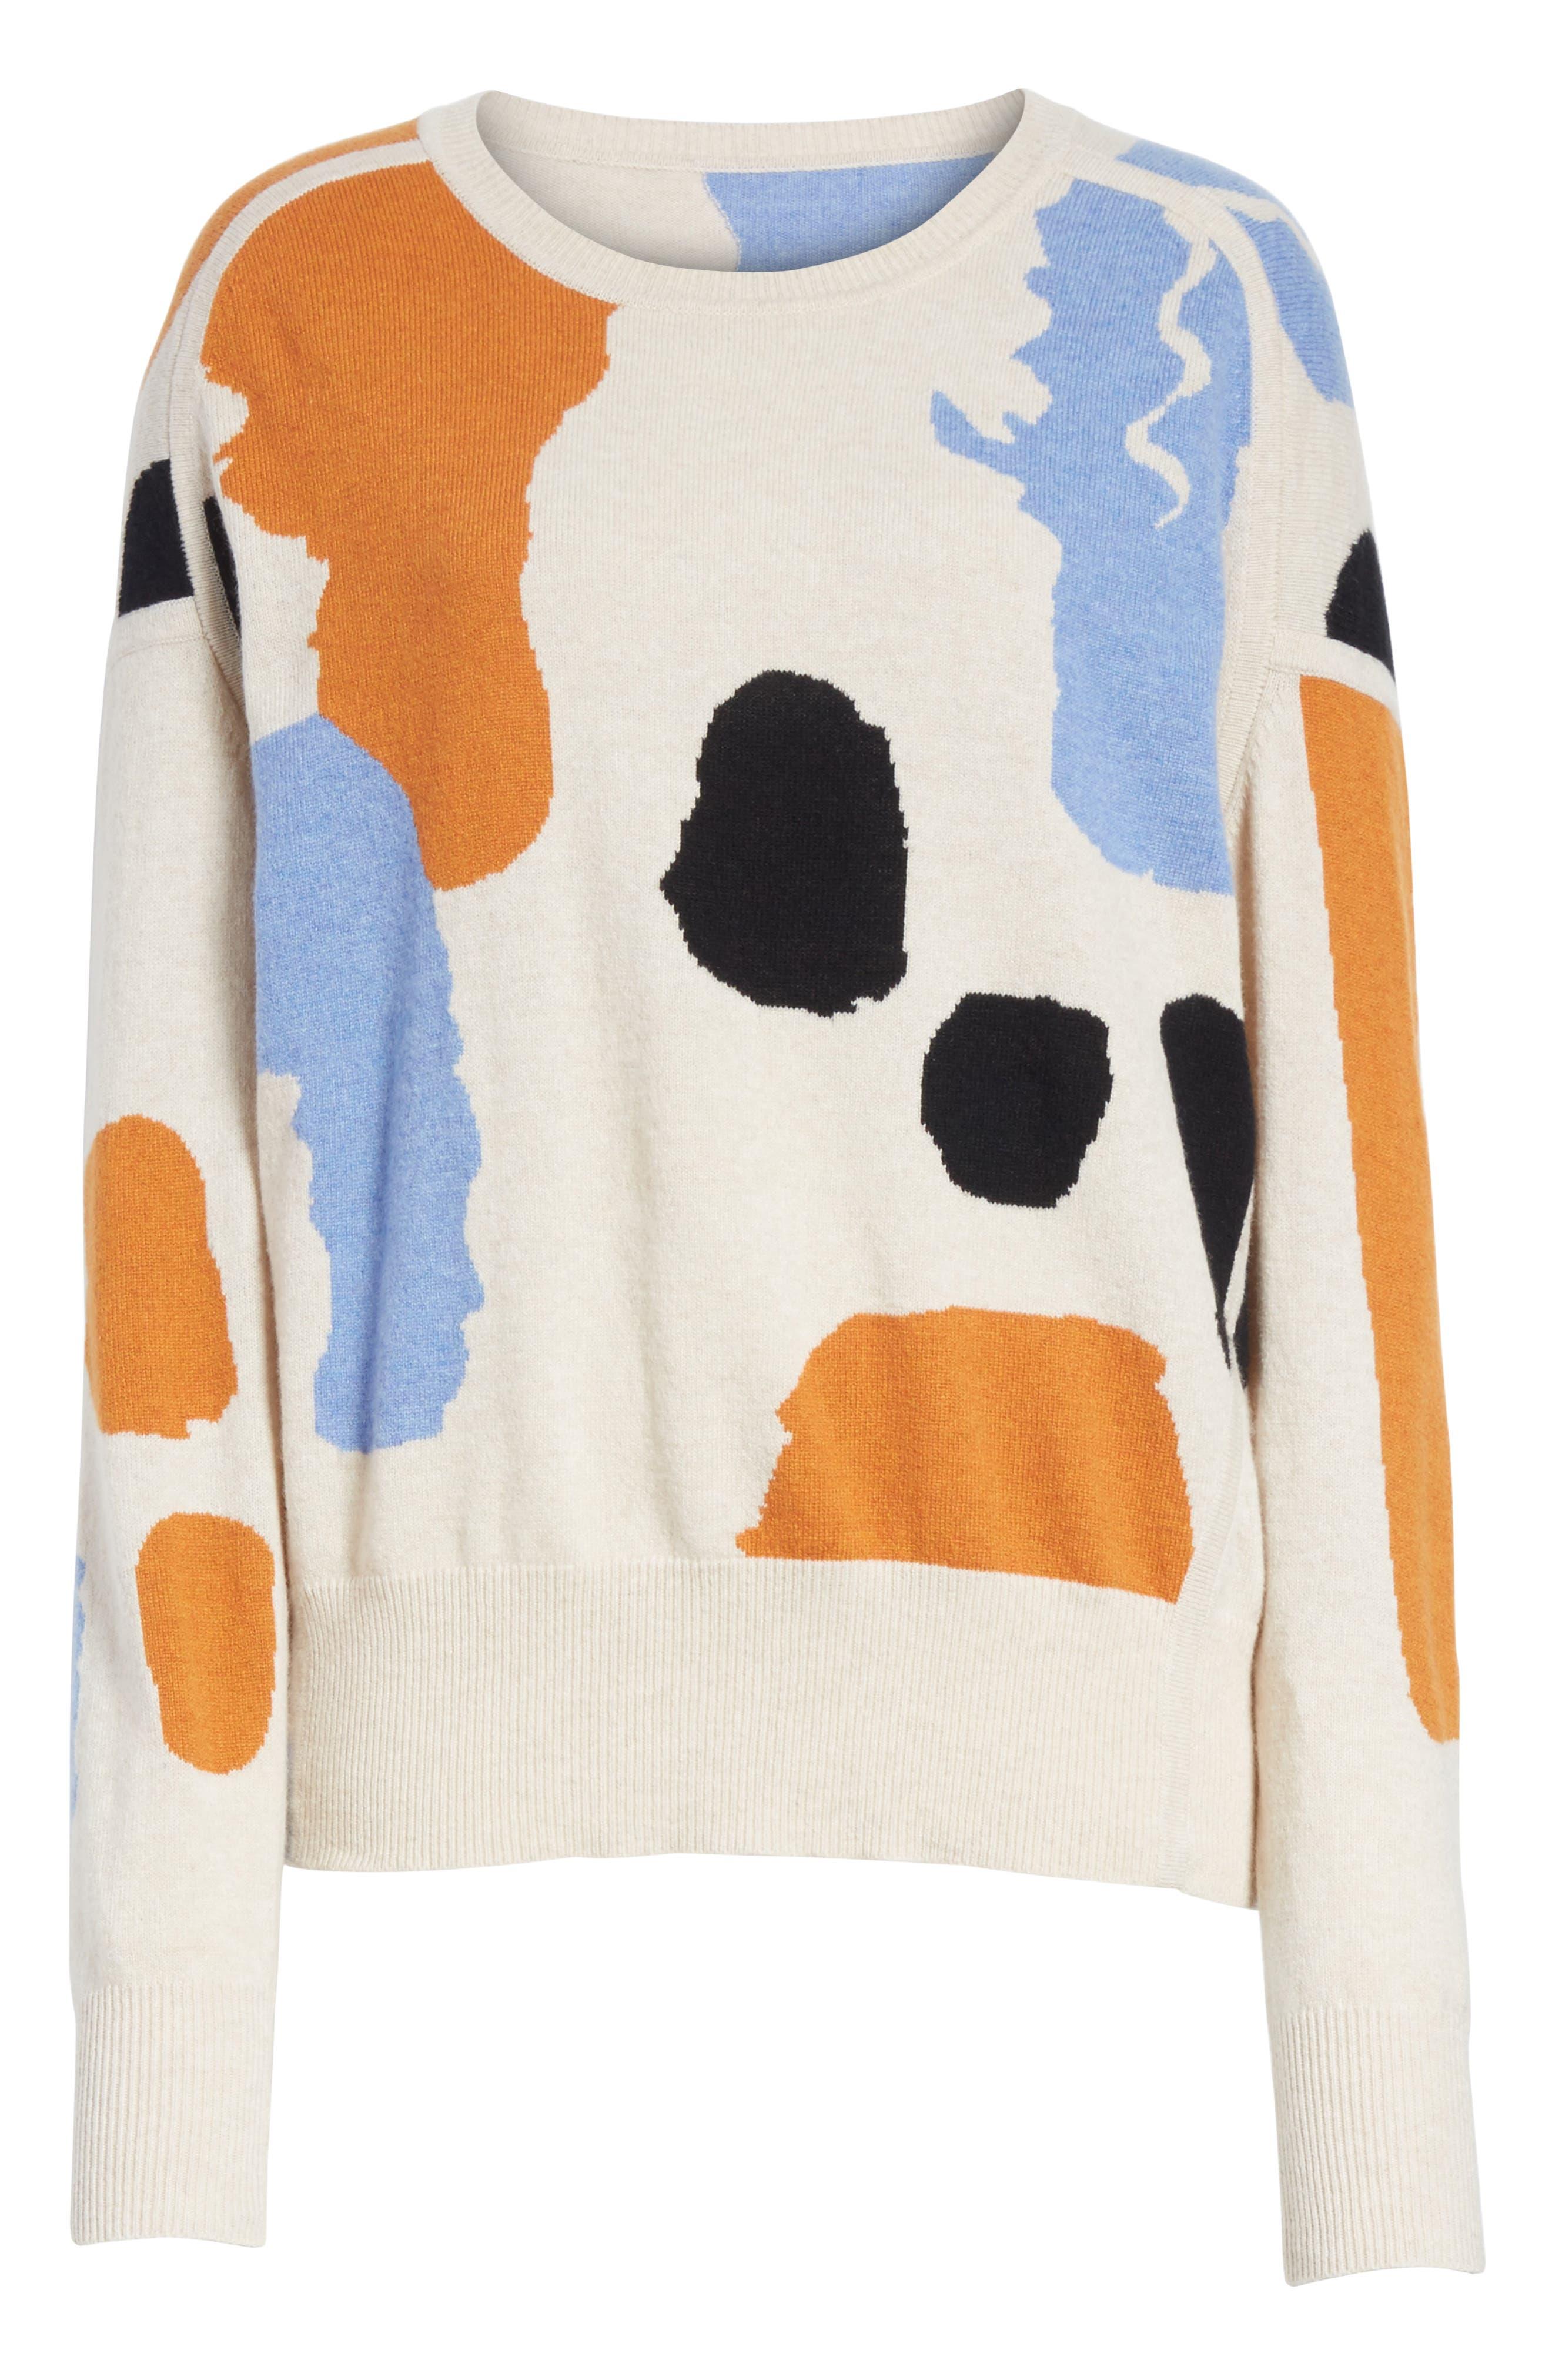 Palette Cashmere & Merino Wool Sweater,                             Alternate thumbnail 6, color,                             Palette Greige